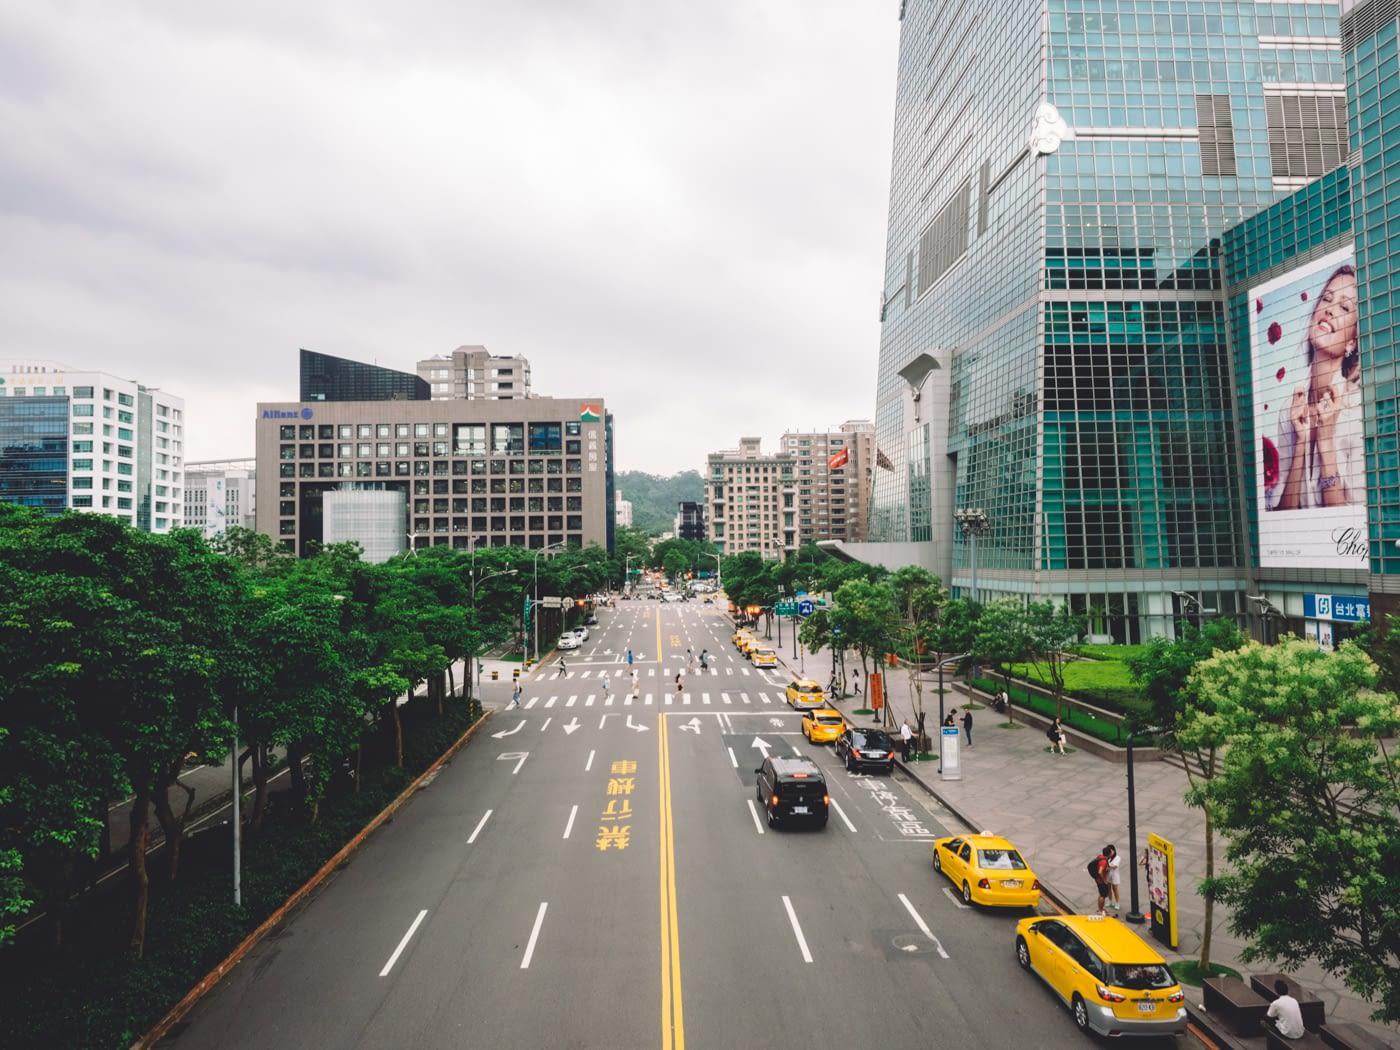 Taiwan - Taipei - Yellow taxis on the street